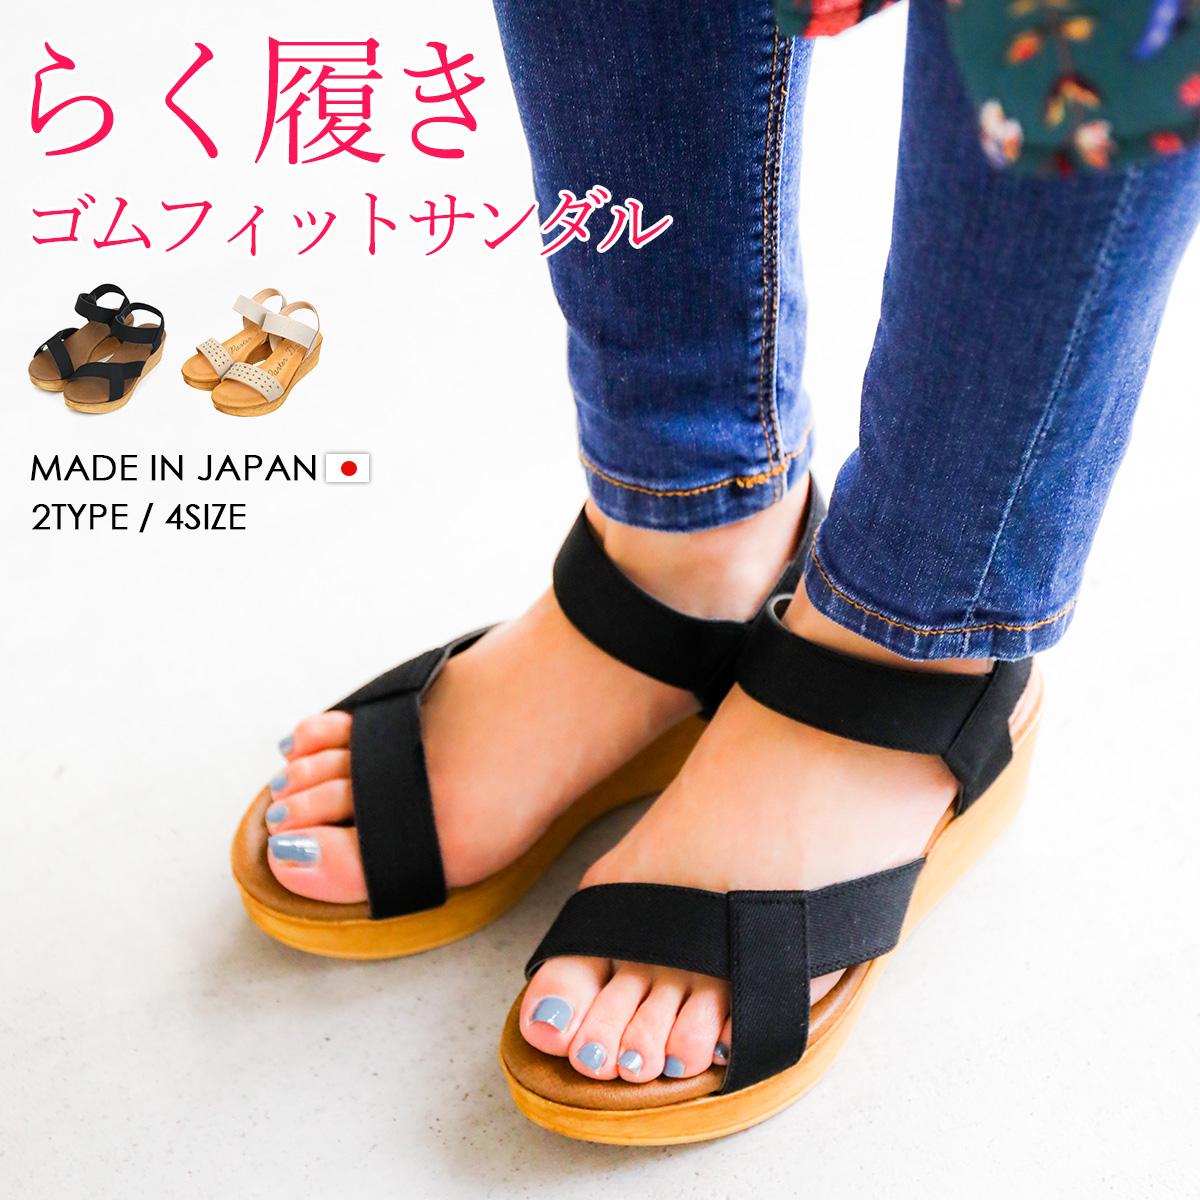 0cm Walk Made Fitting Sabot Trip In And 5 Platform Rubber Heel Summer Comfort Japan Spring Lady's The Sandals 9IED2HW